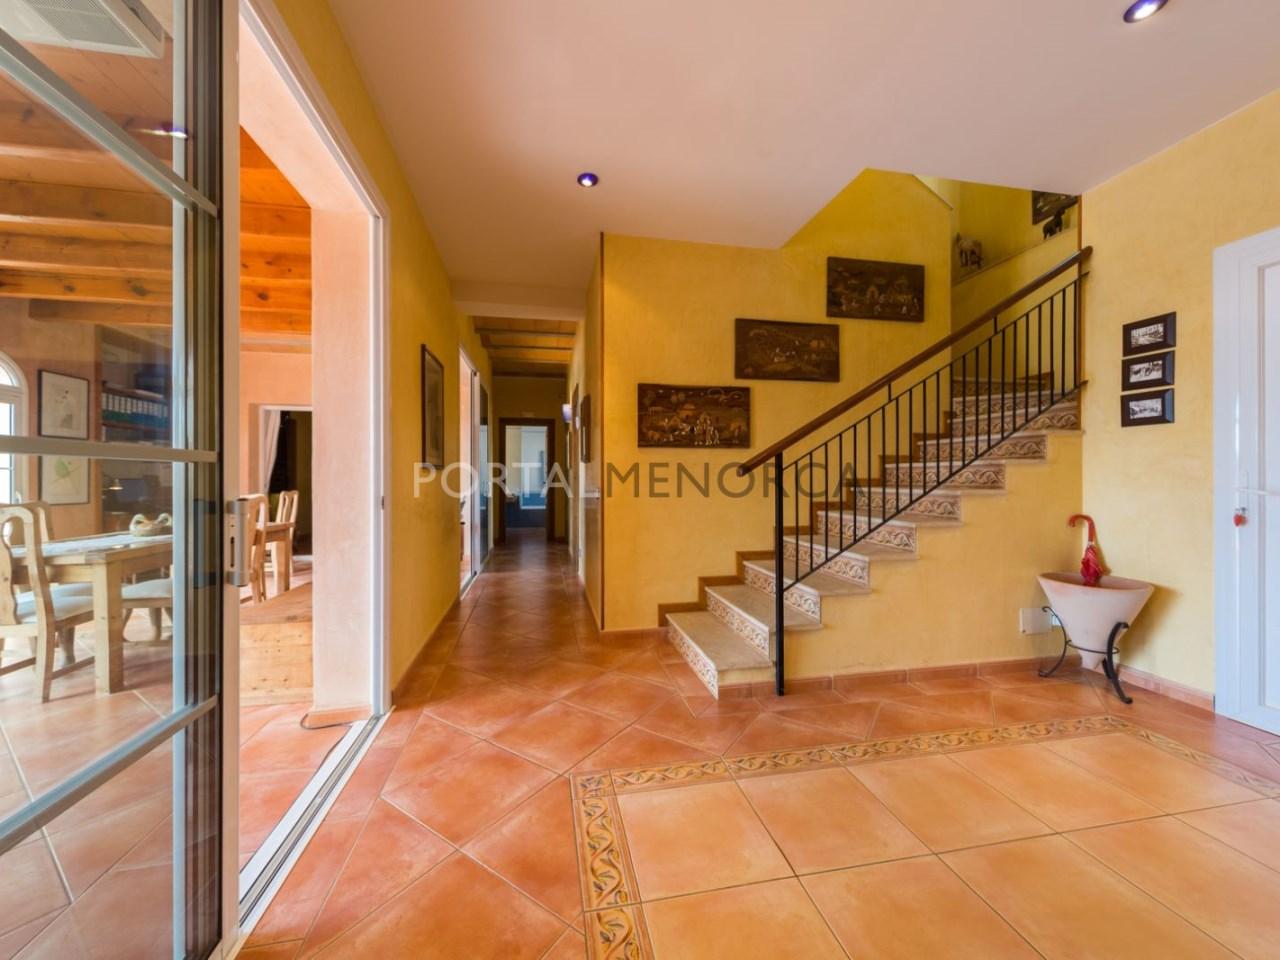 Casa de campo con piscina en Menorca (36 de 41)